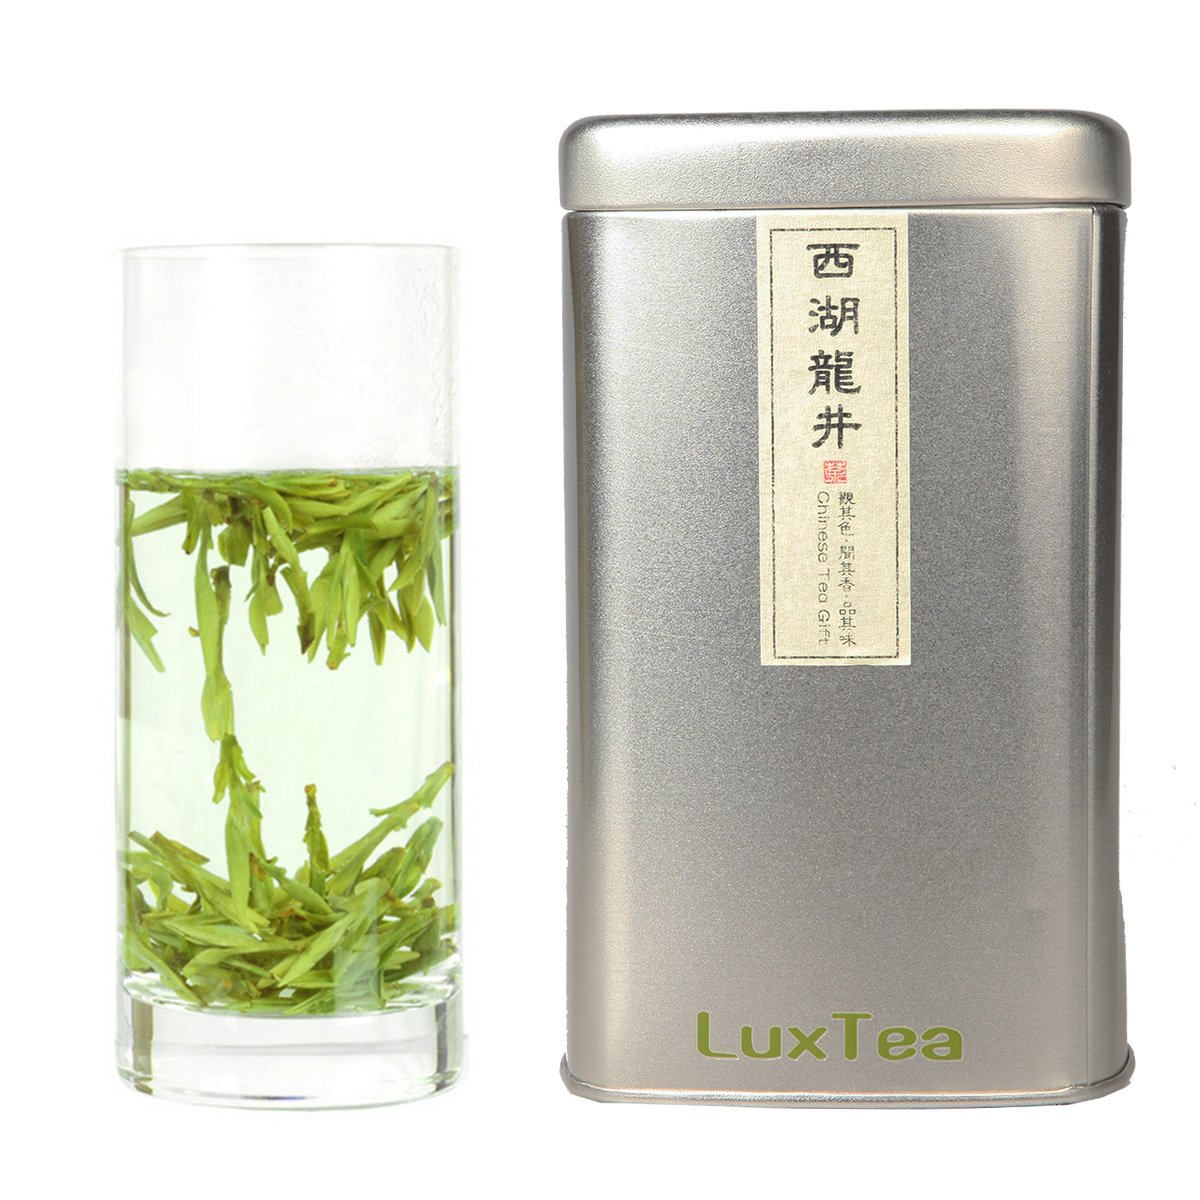 Luxtea Chinese Top10 Famous Tea - Xihu Long Jing/West Lake Dragon Well/Longjing - Grade AAA (Super Grade) by Luxtea